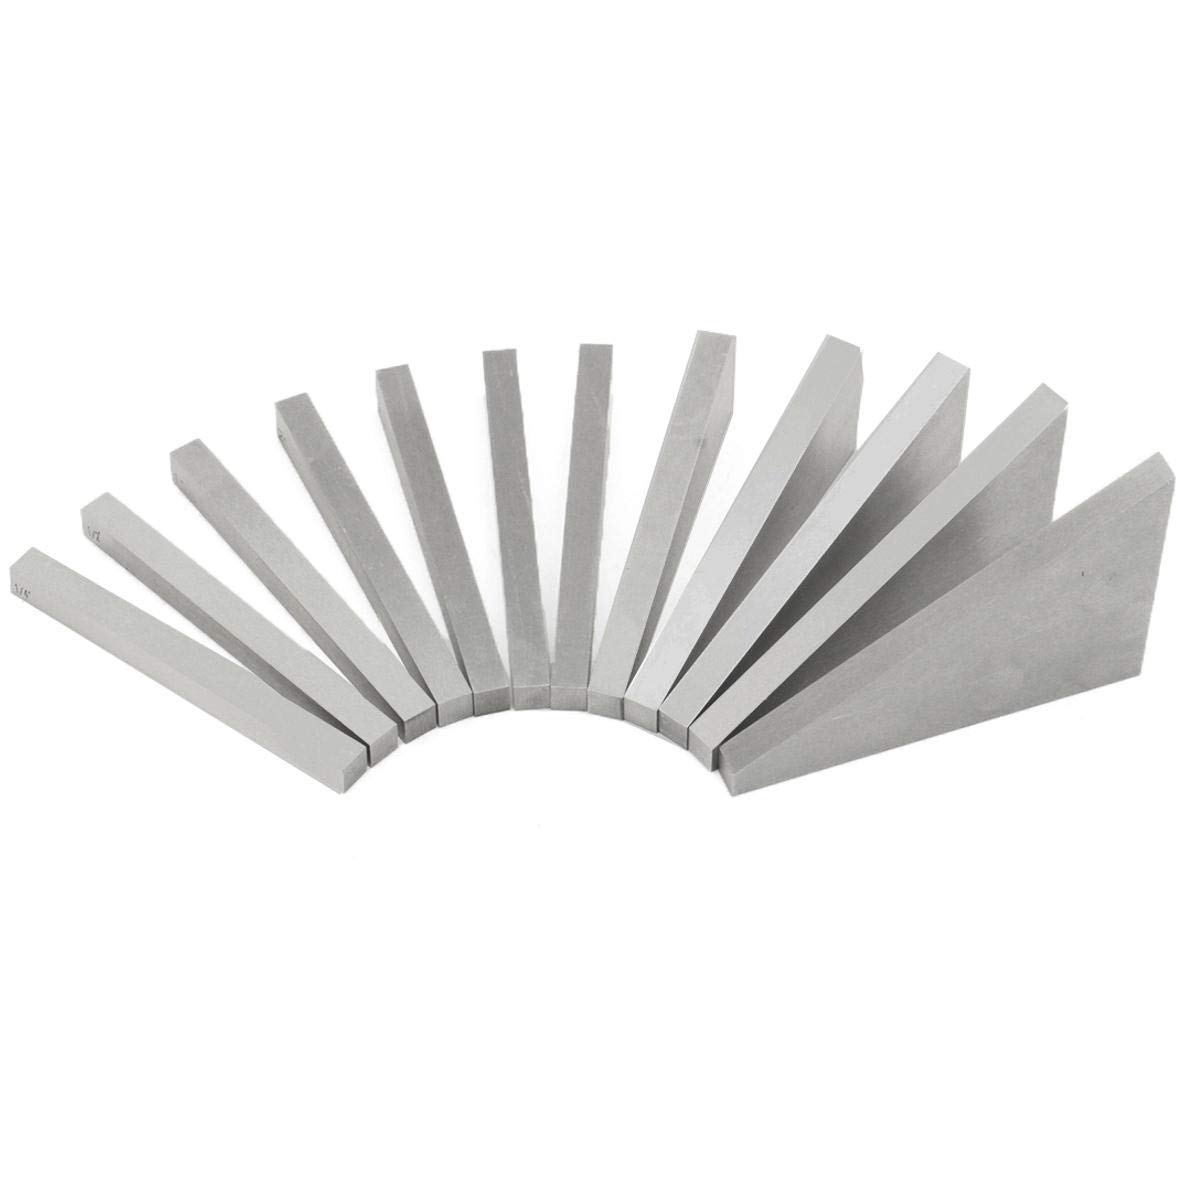 12 PCS Precision Angle Blocks Set Lathes Milling Machinist 1/4 1/2 1-30 Degrees